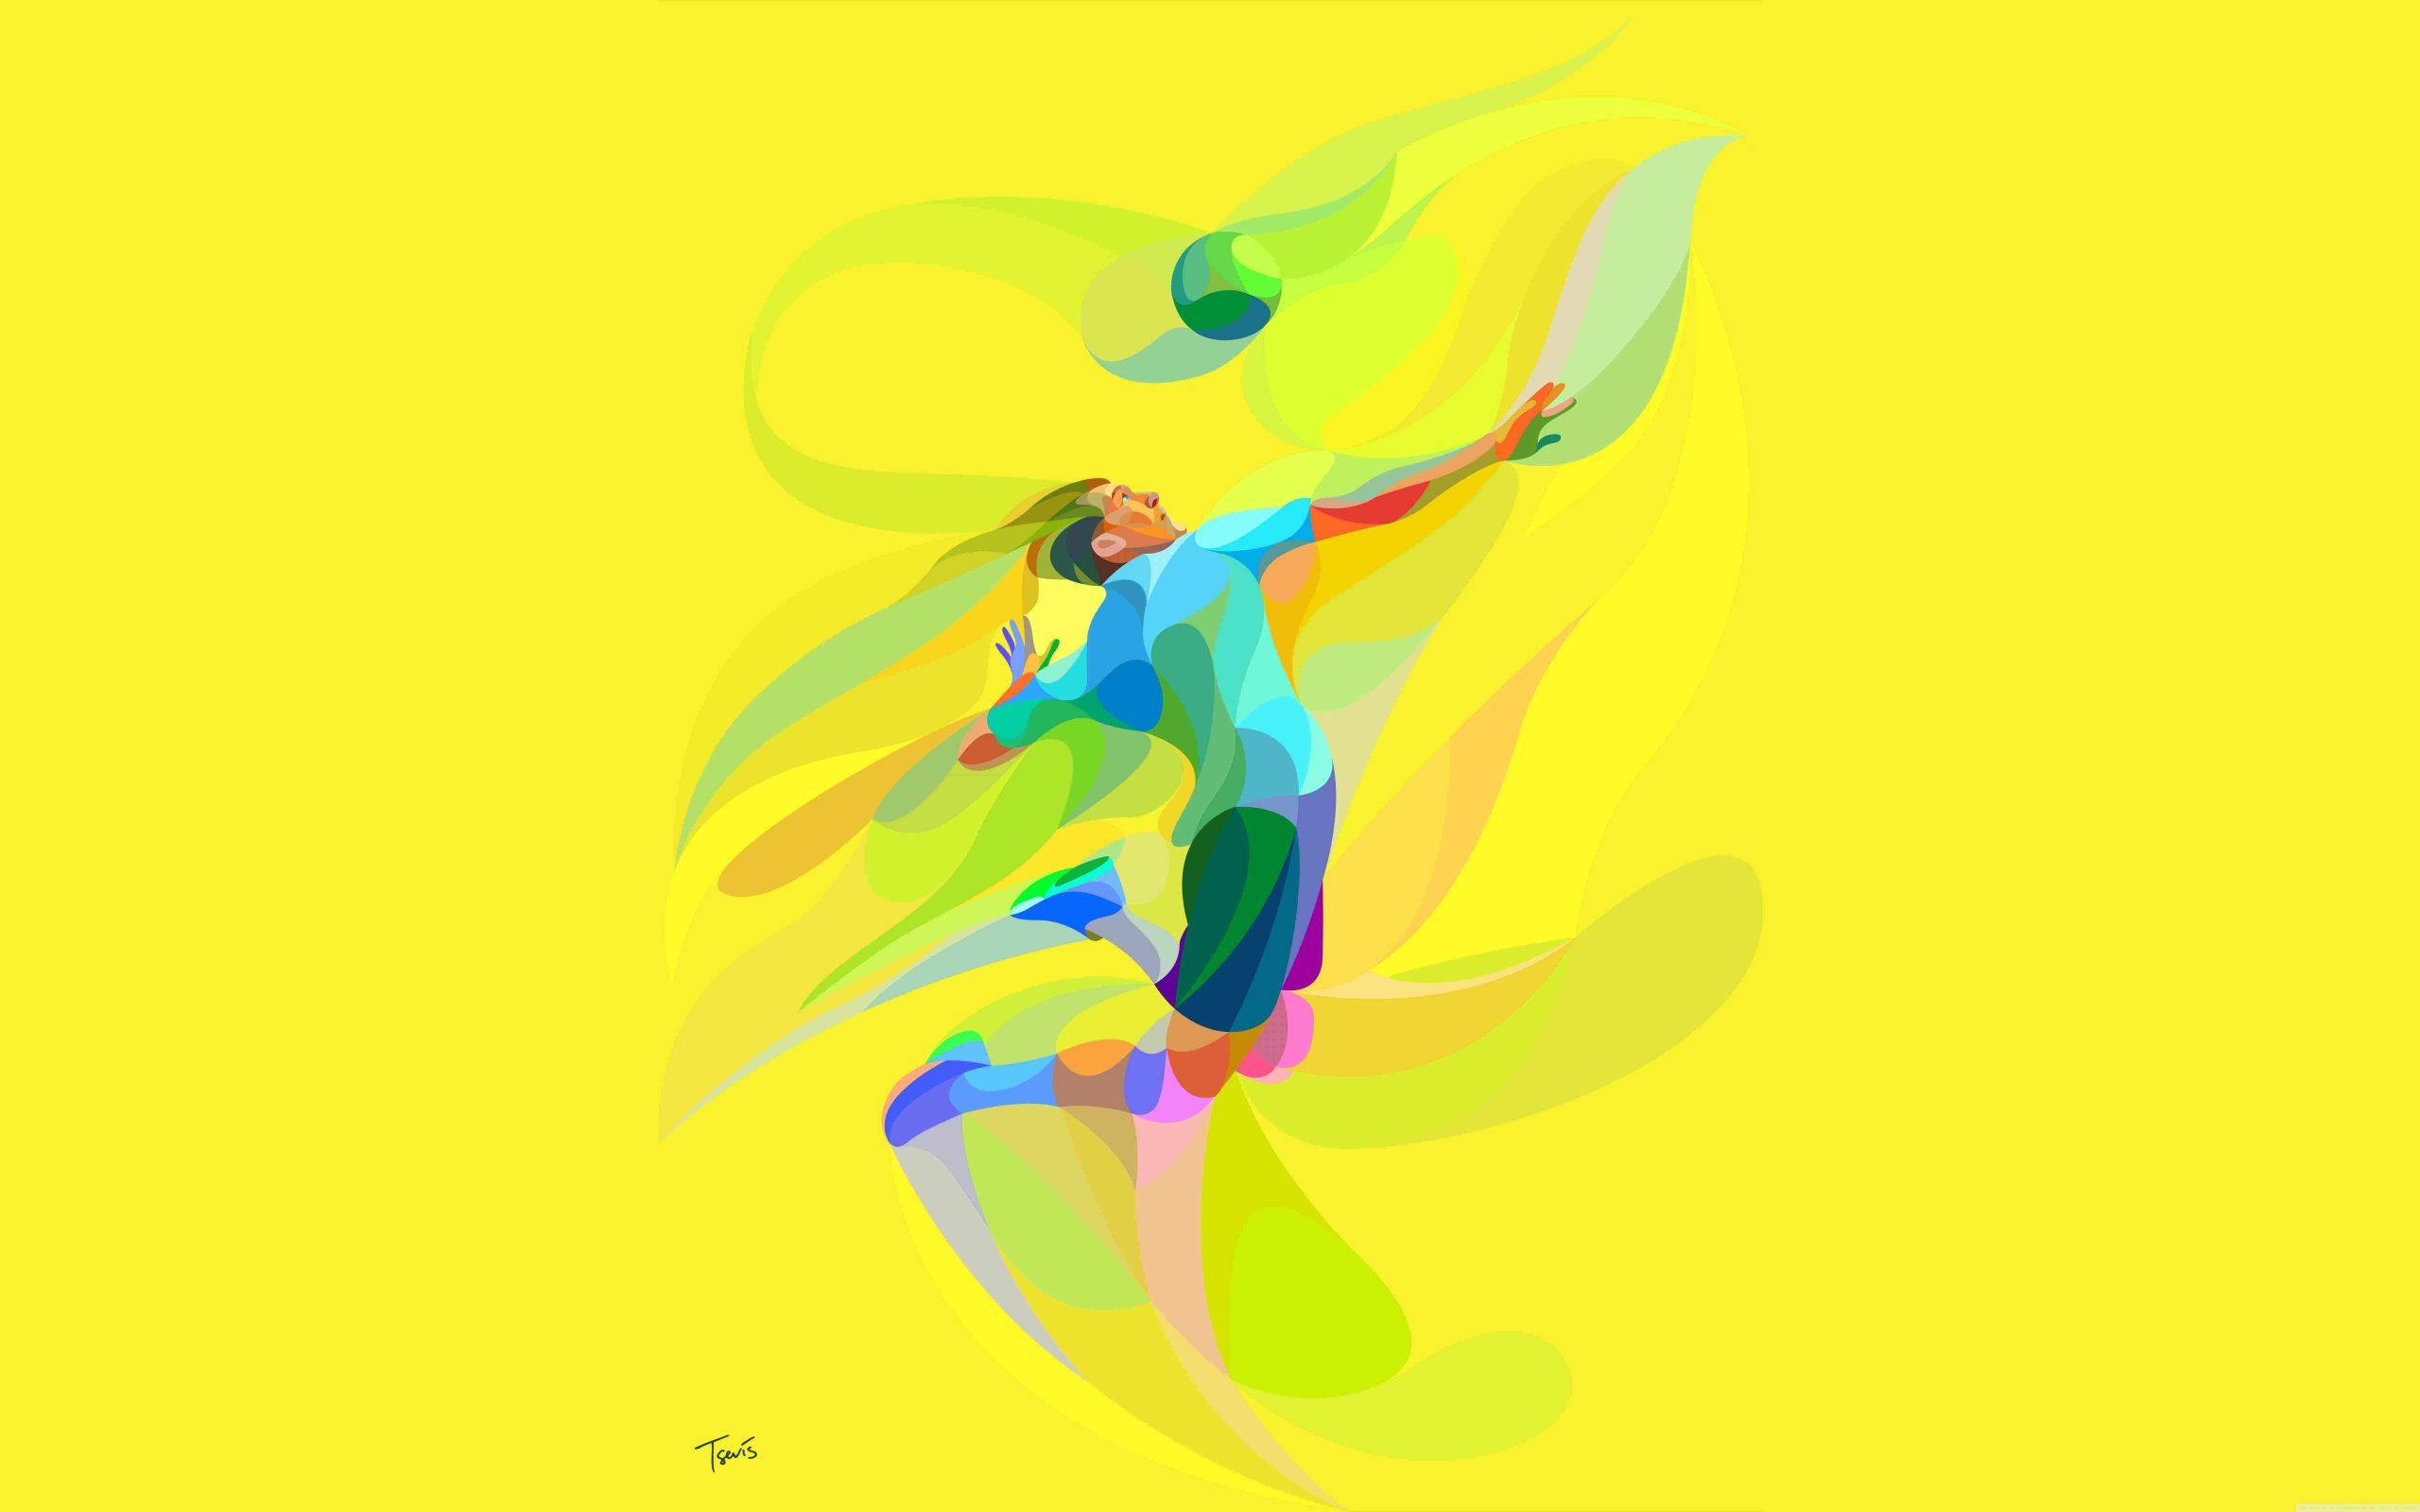 پروفایل توپ زرد والیبال با پس زمینه گرافیکی و دیدنی